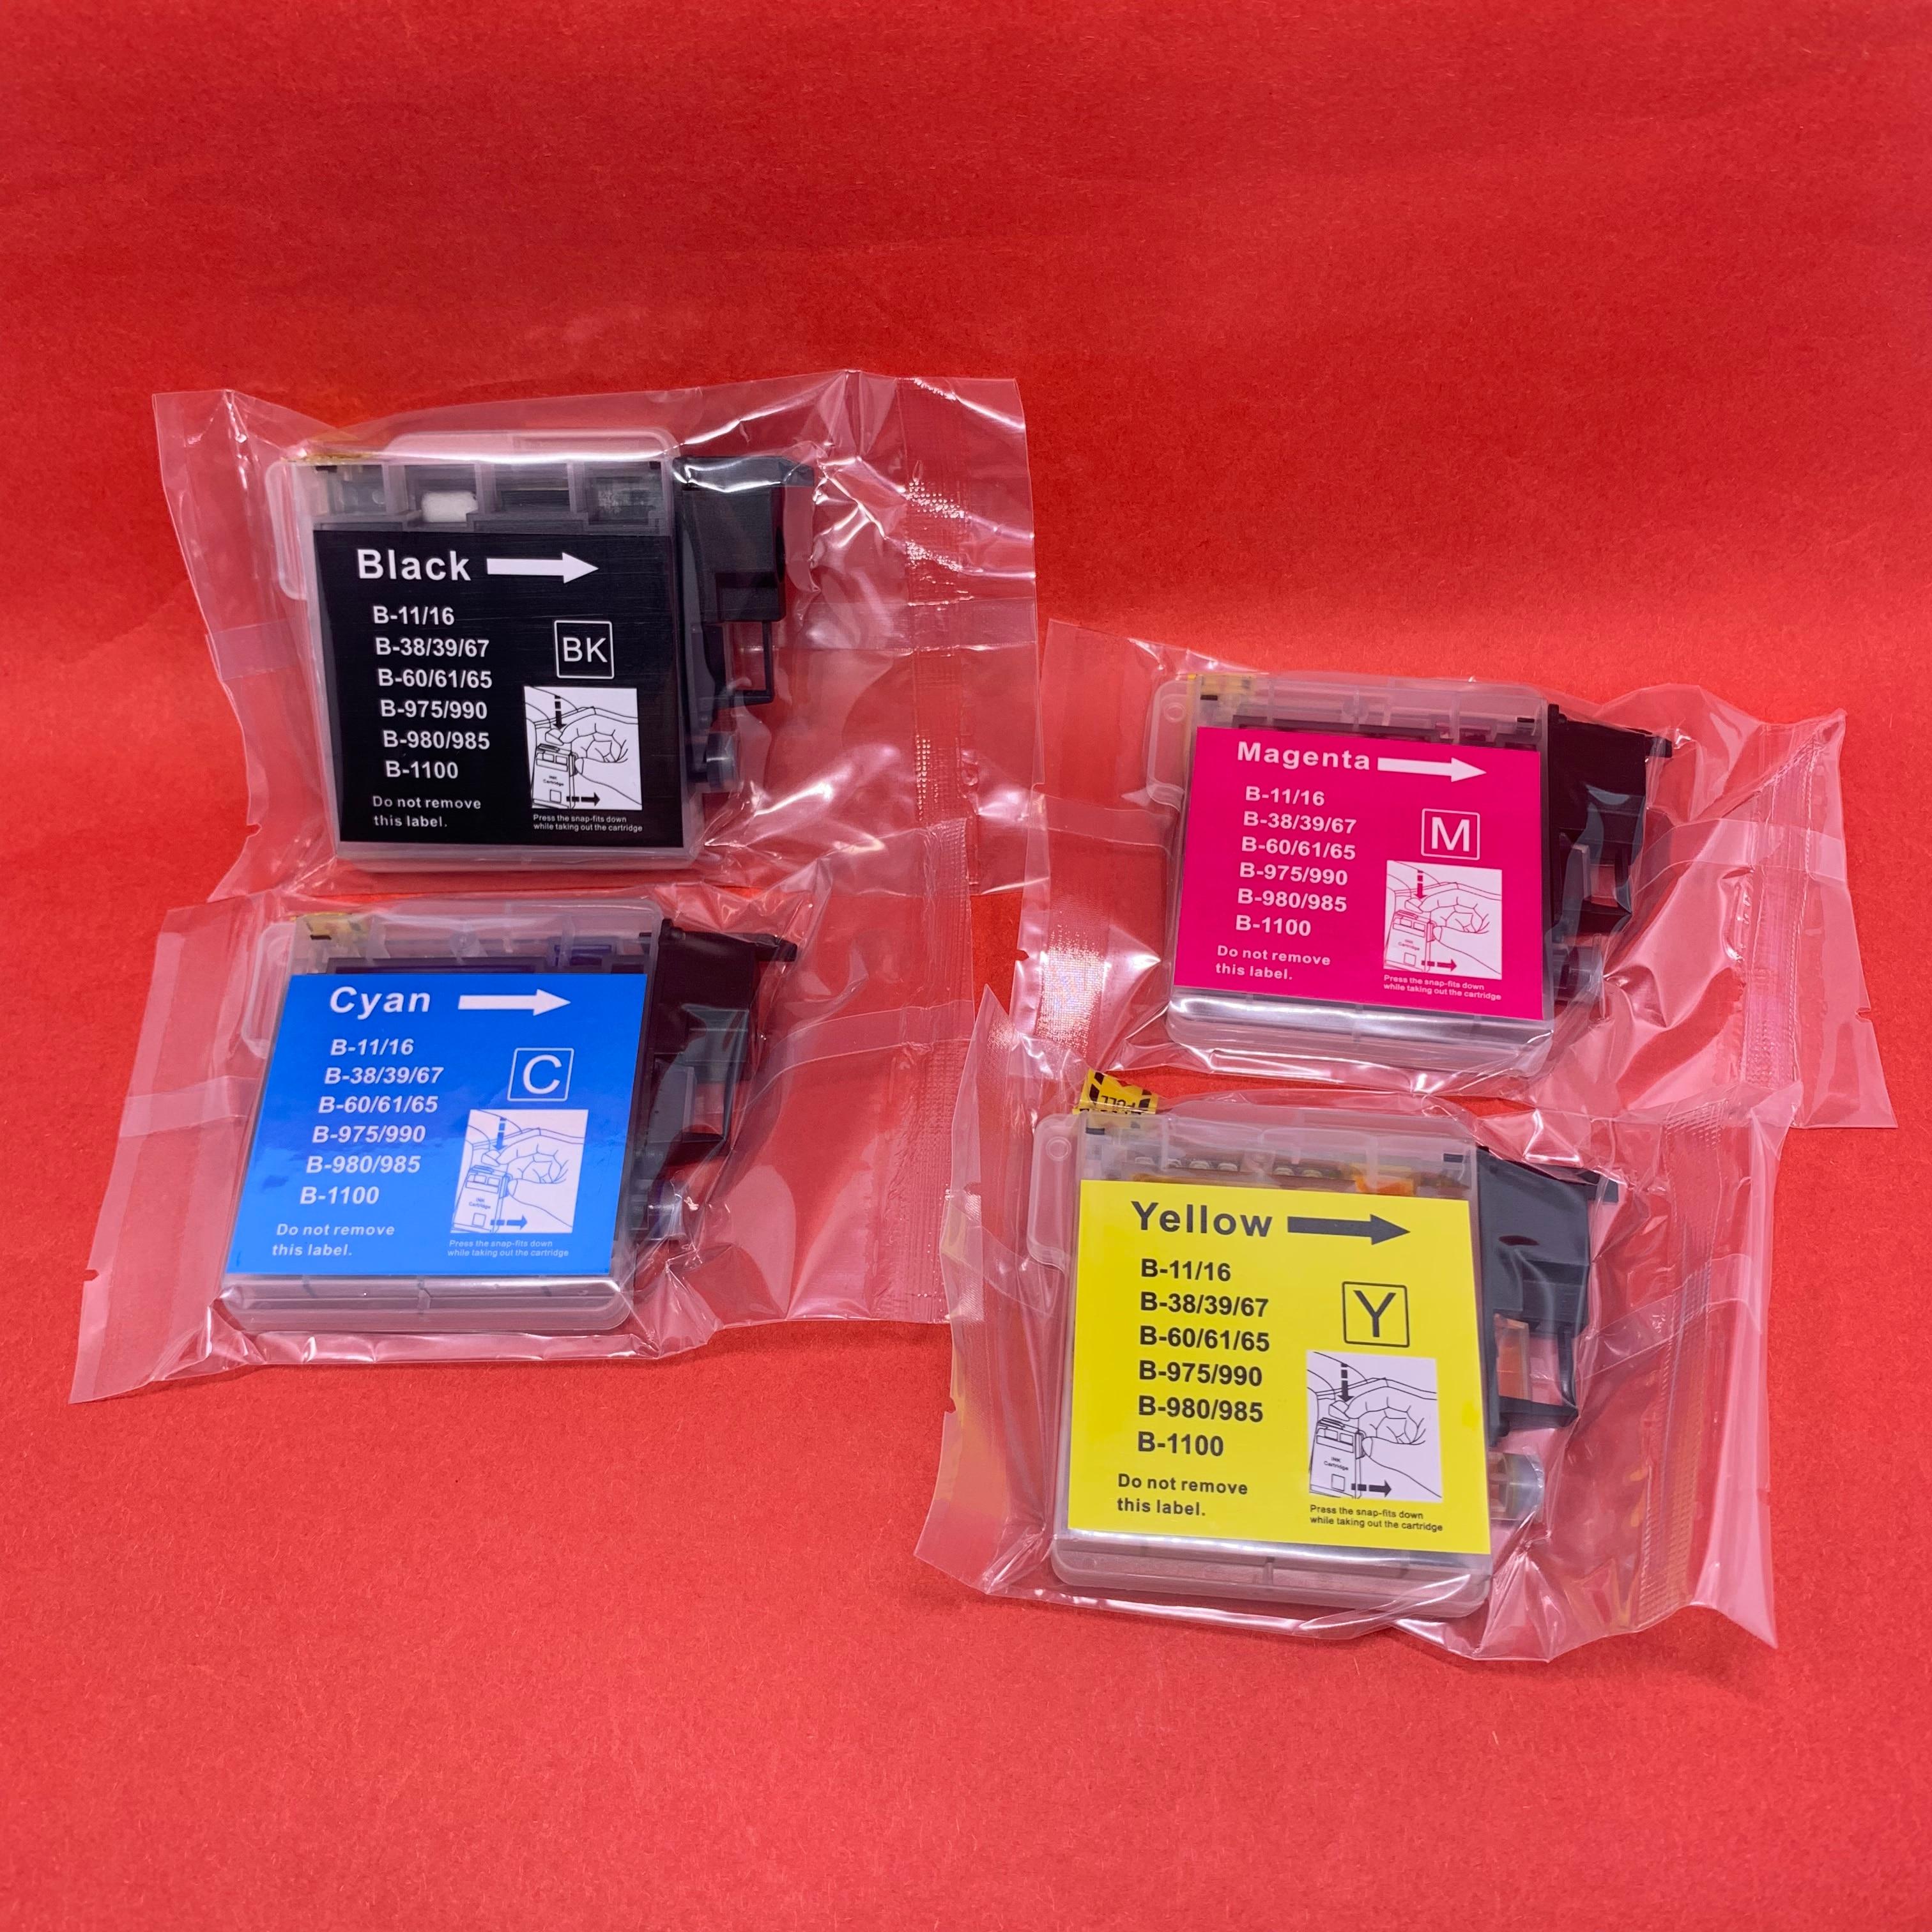 YOTAT cartouche dencre Compatible LC39 LC60 LC975 LC985 pour Frère DCP-J125 DCP-J315W DCP-J515W MFC-J220 MFC-J265W MFC-J410/J415W